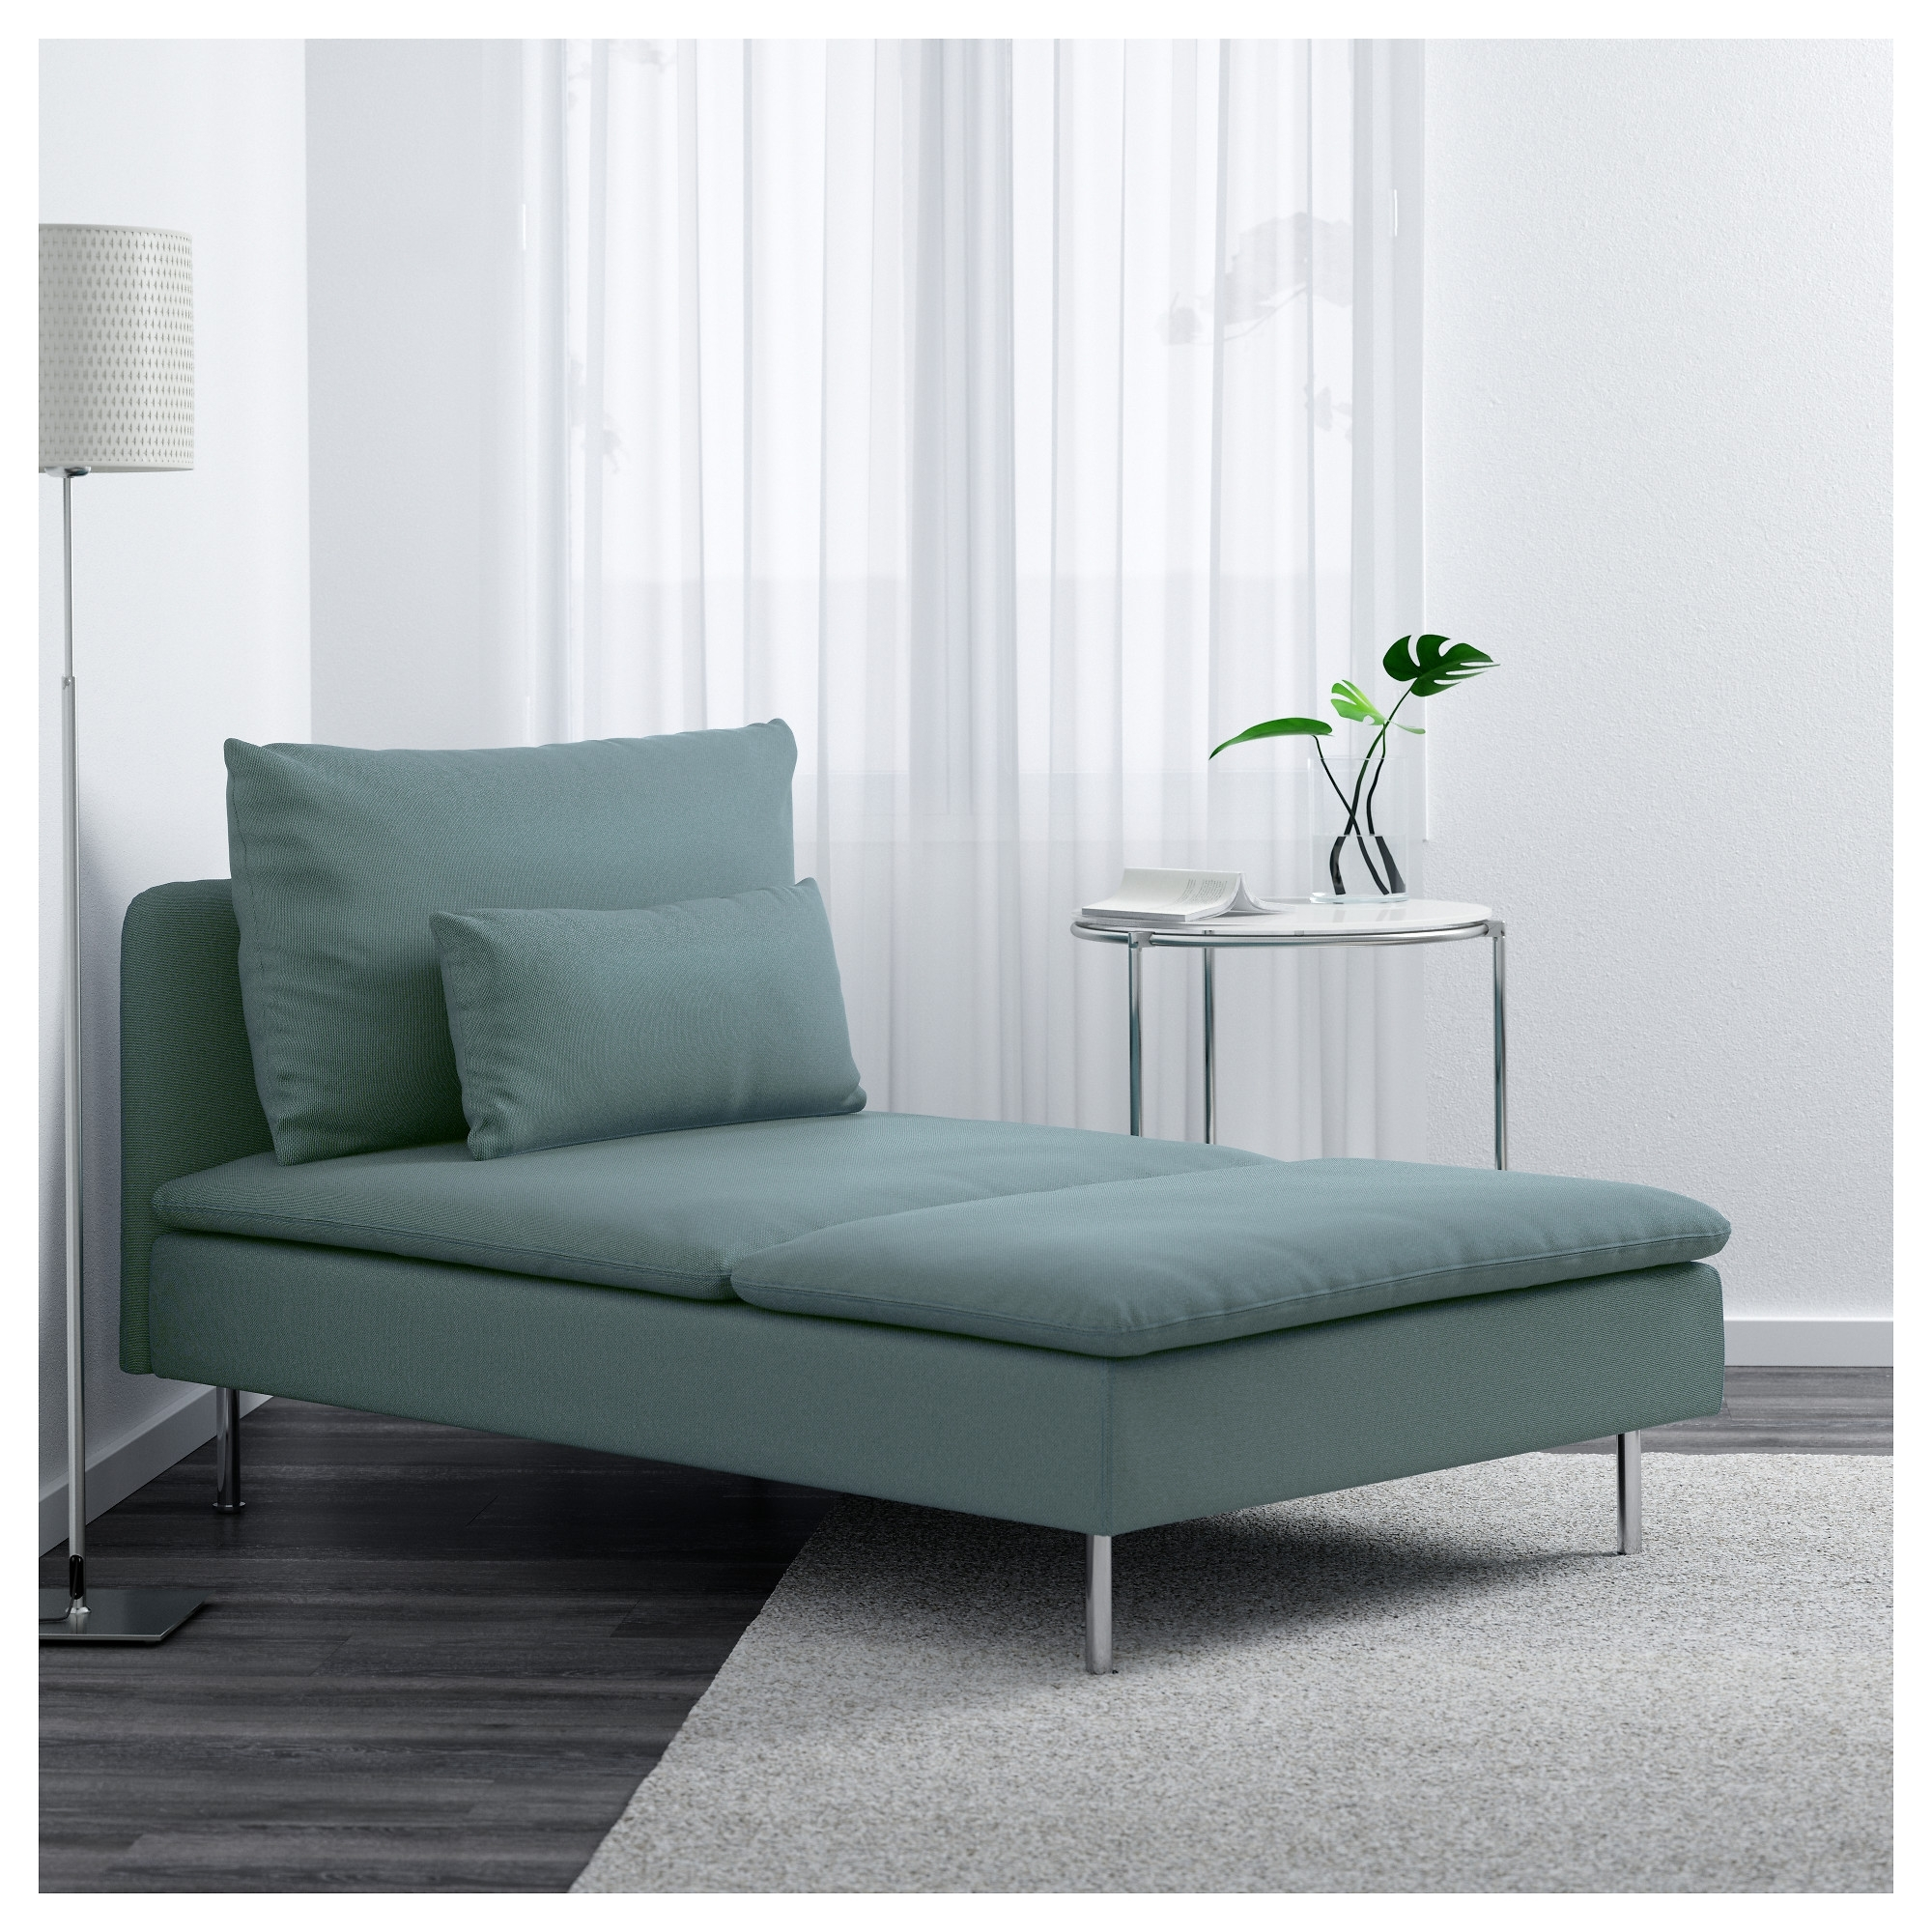 Famous Söderhamn Chaise Longue – Finnsta Turquoise – Ikea Regarding Ikea Chaise Longues (View 3 of 15)